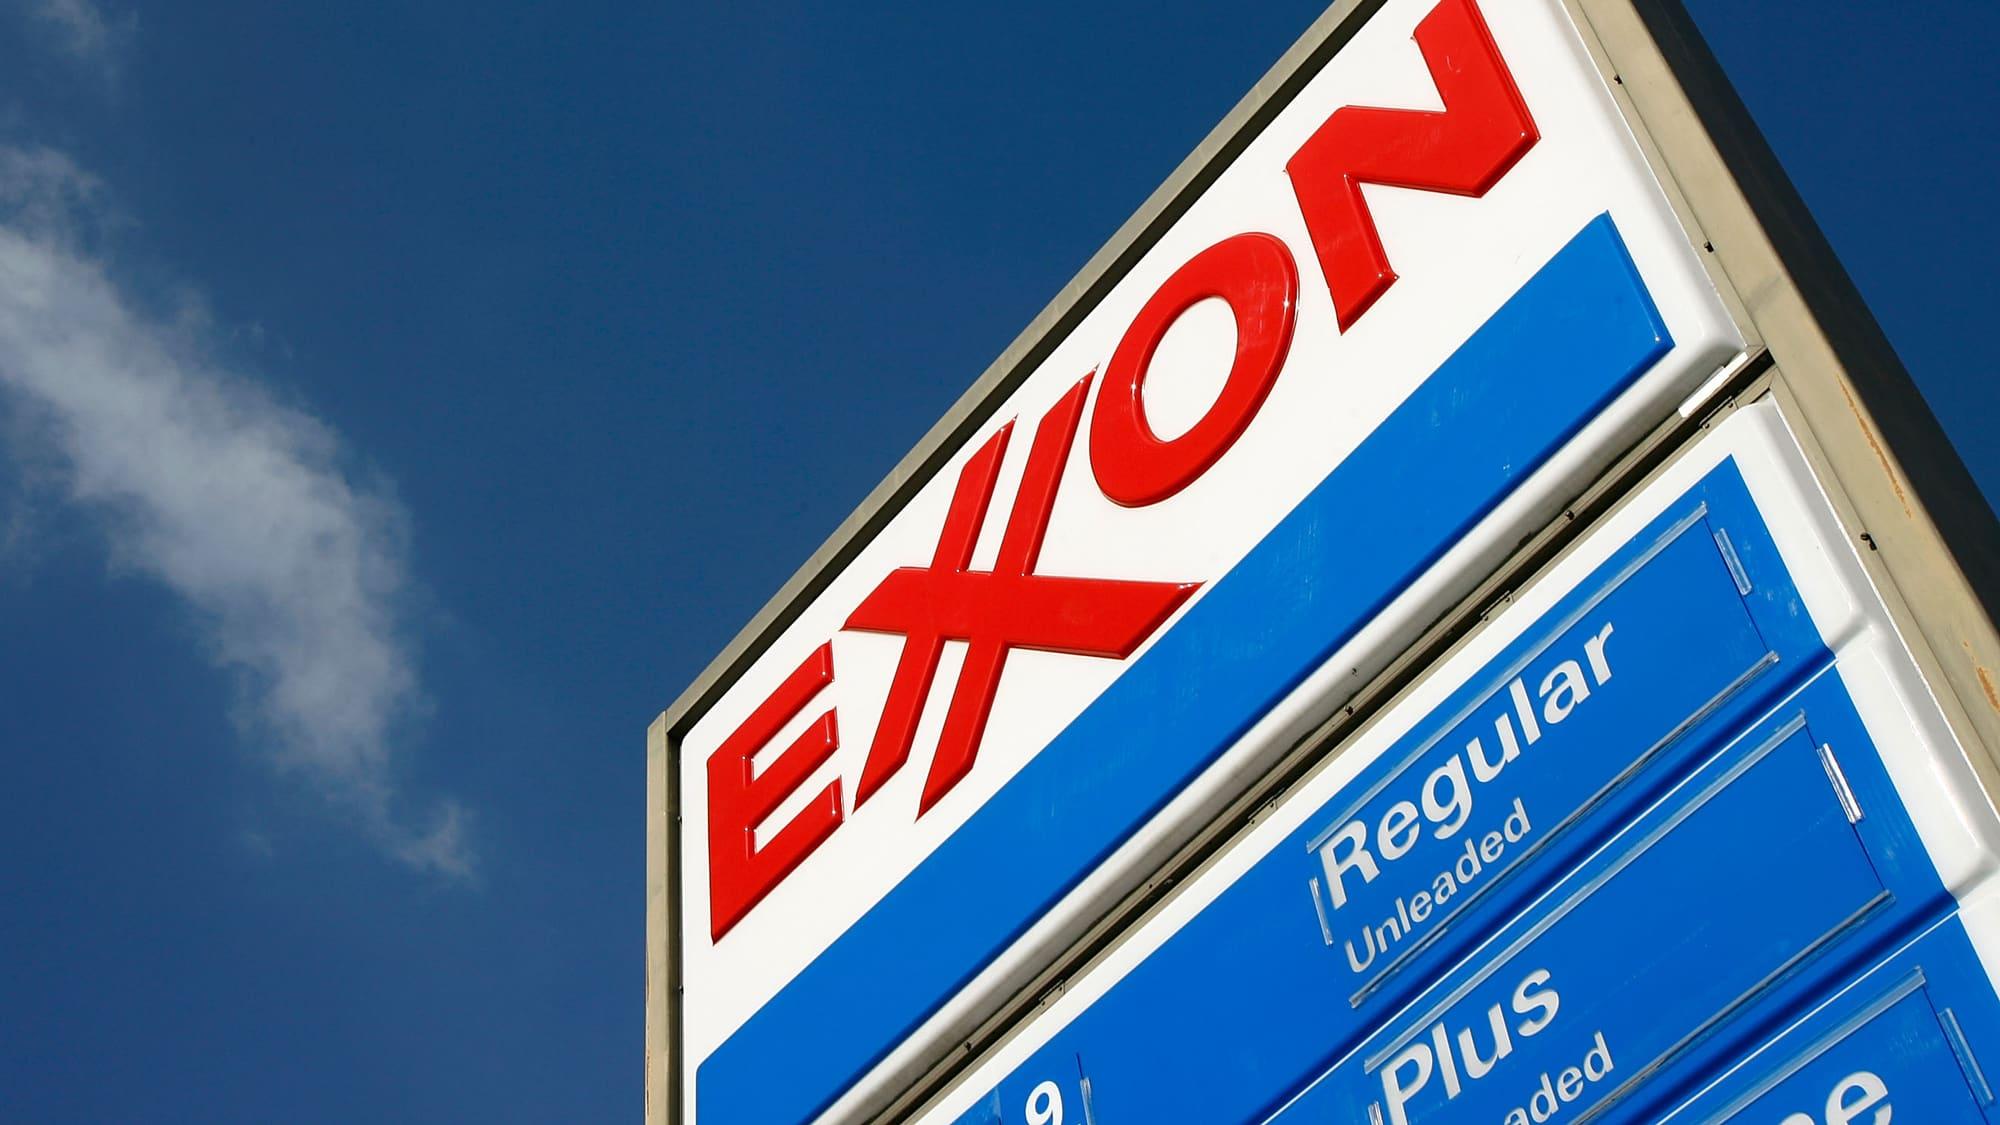 Exxon Mobil Shares Plunge As Oil Giant Misses On Fourth Quarter Profit